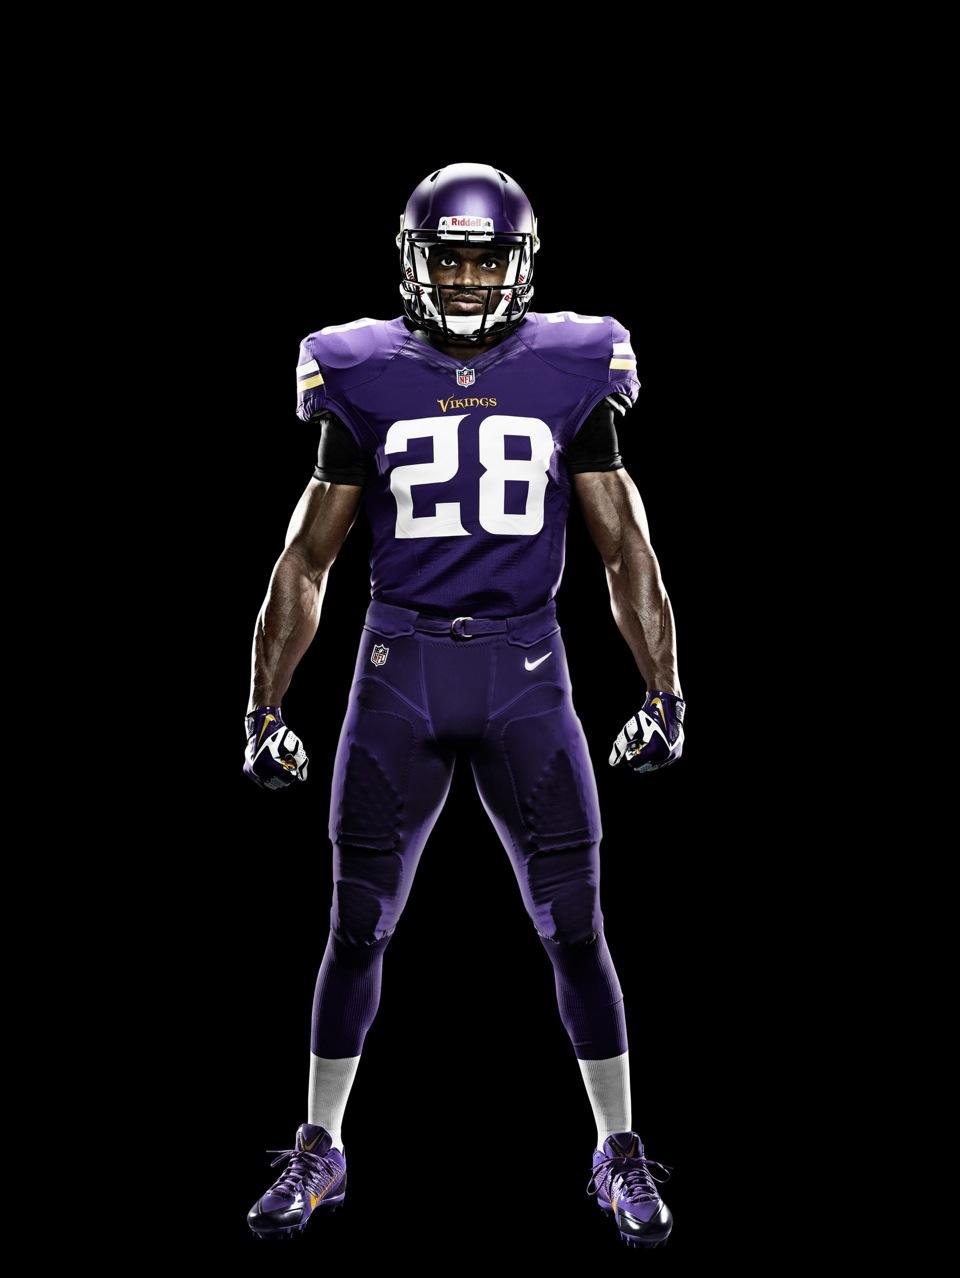 Minnesota Vikings Simplify Look with New Nike Uniform | Chris ...